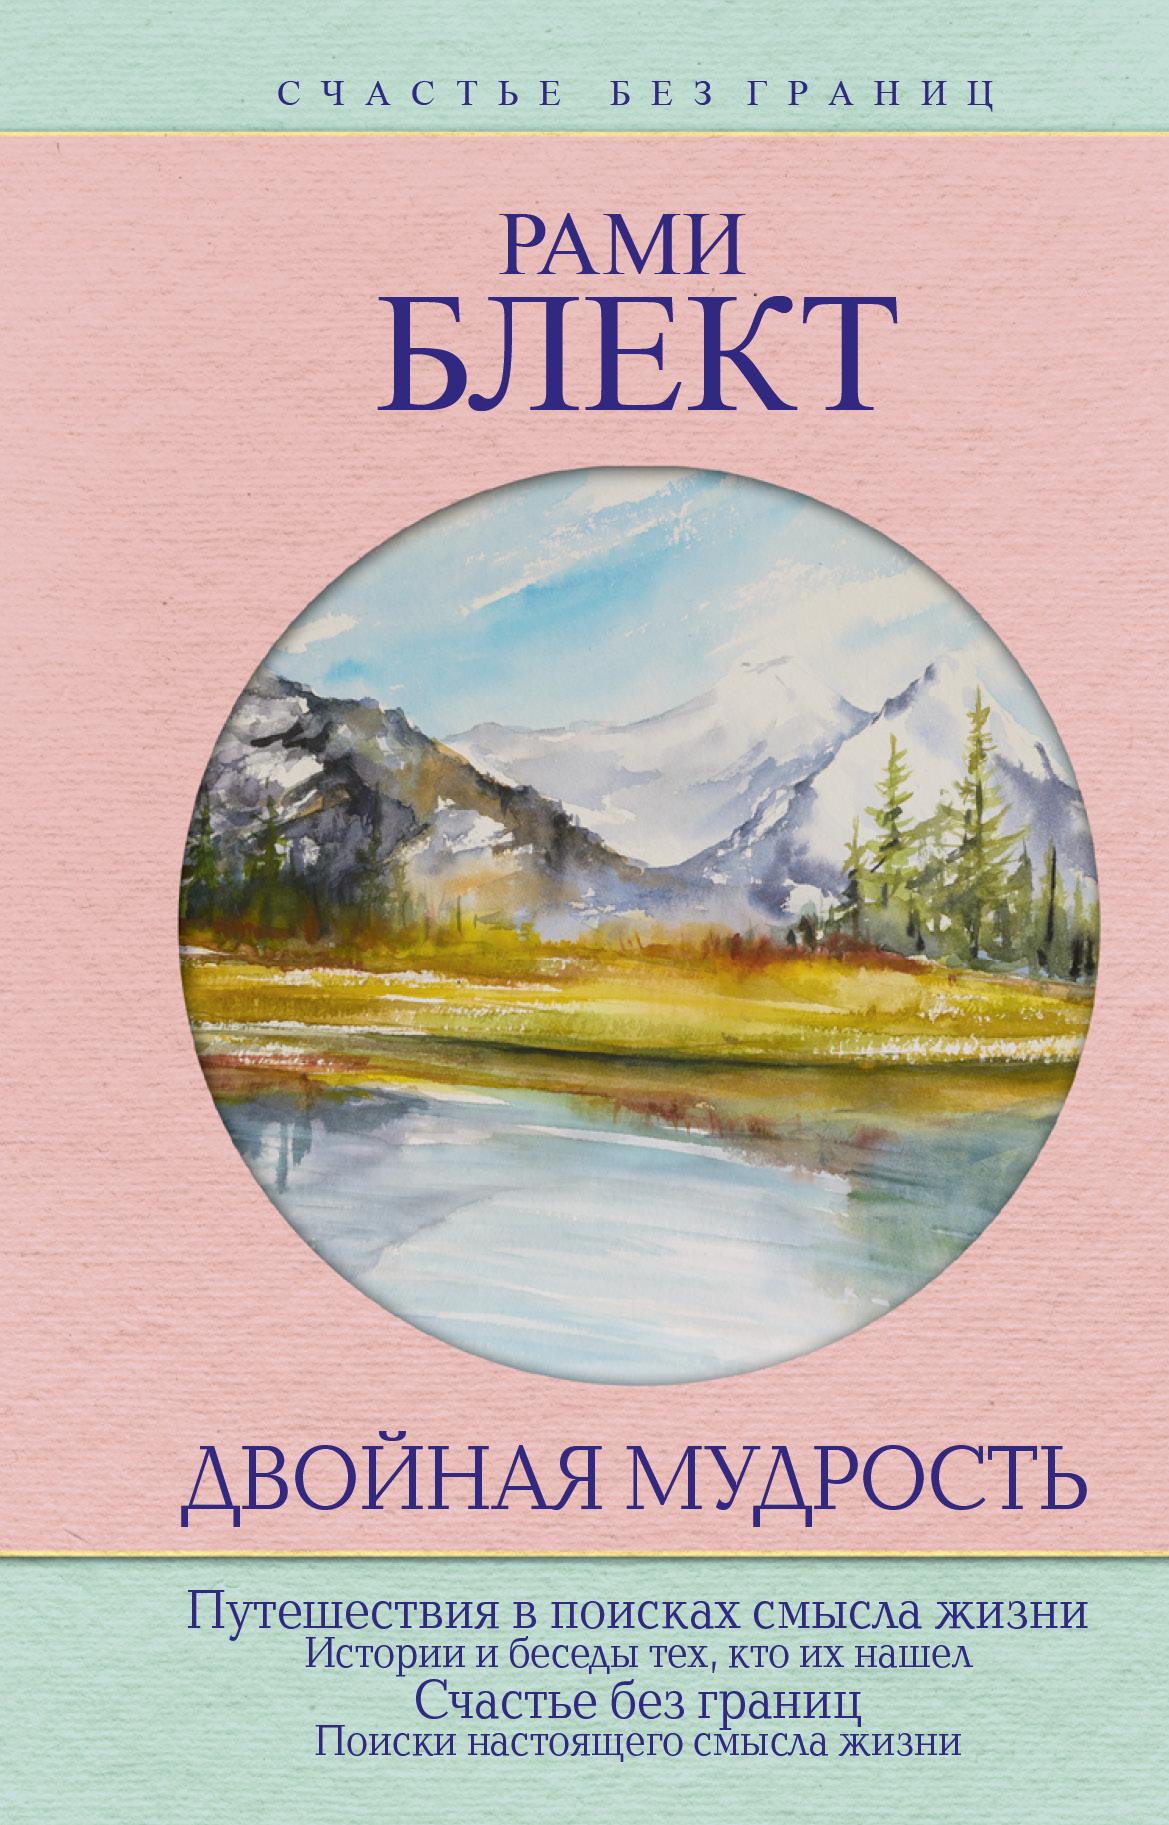 Блект Рами Двойная мудрость ISBN: 978-5-17-107473-9 цена